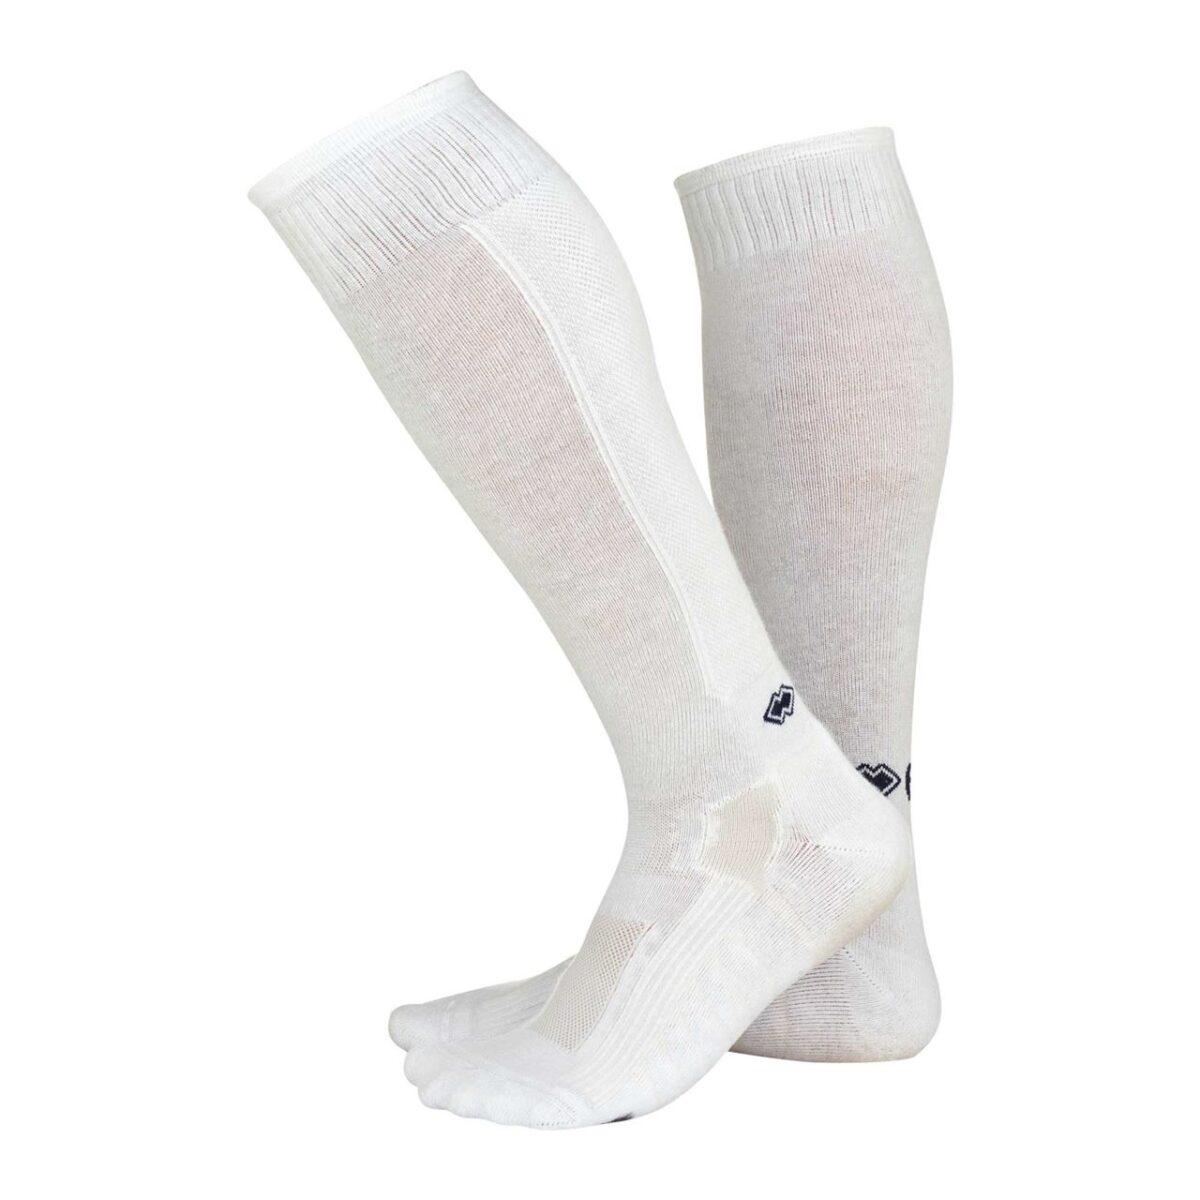 Errea ACTIVE Socks